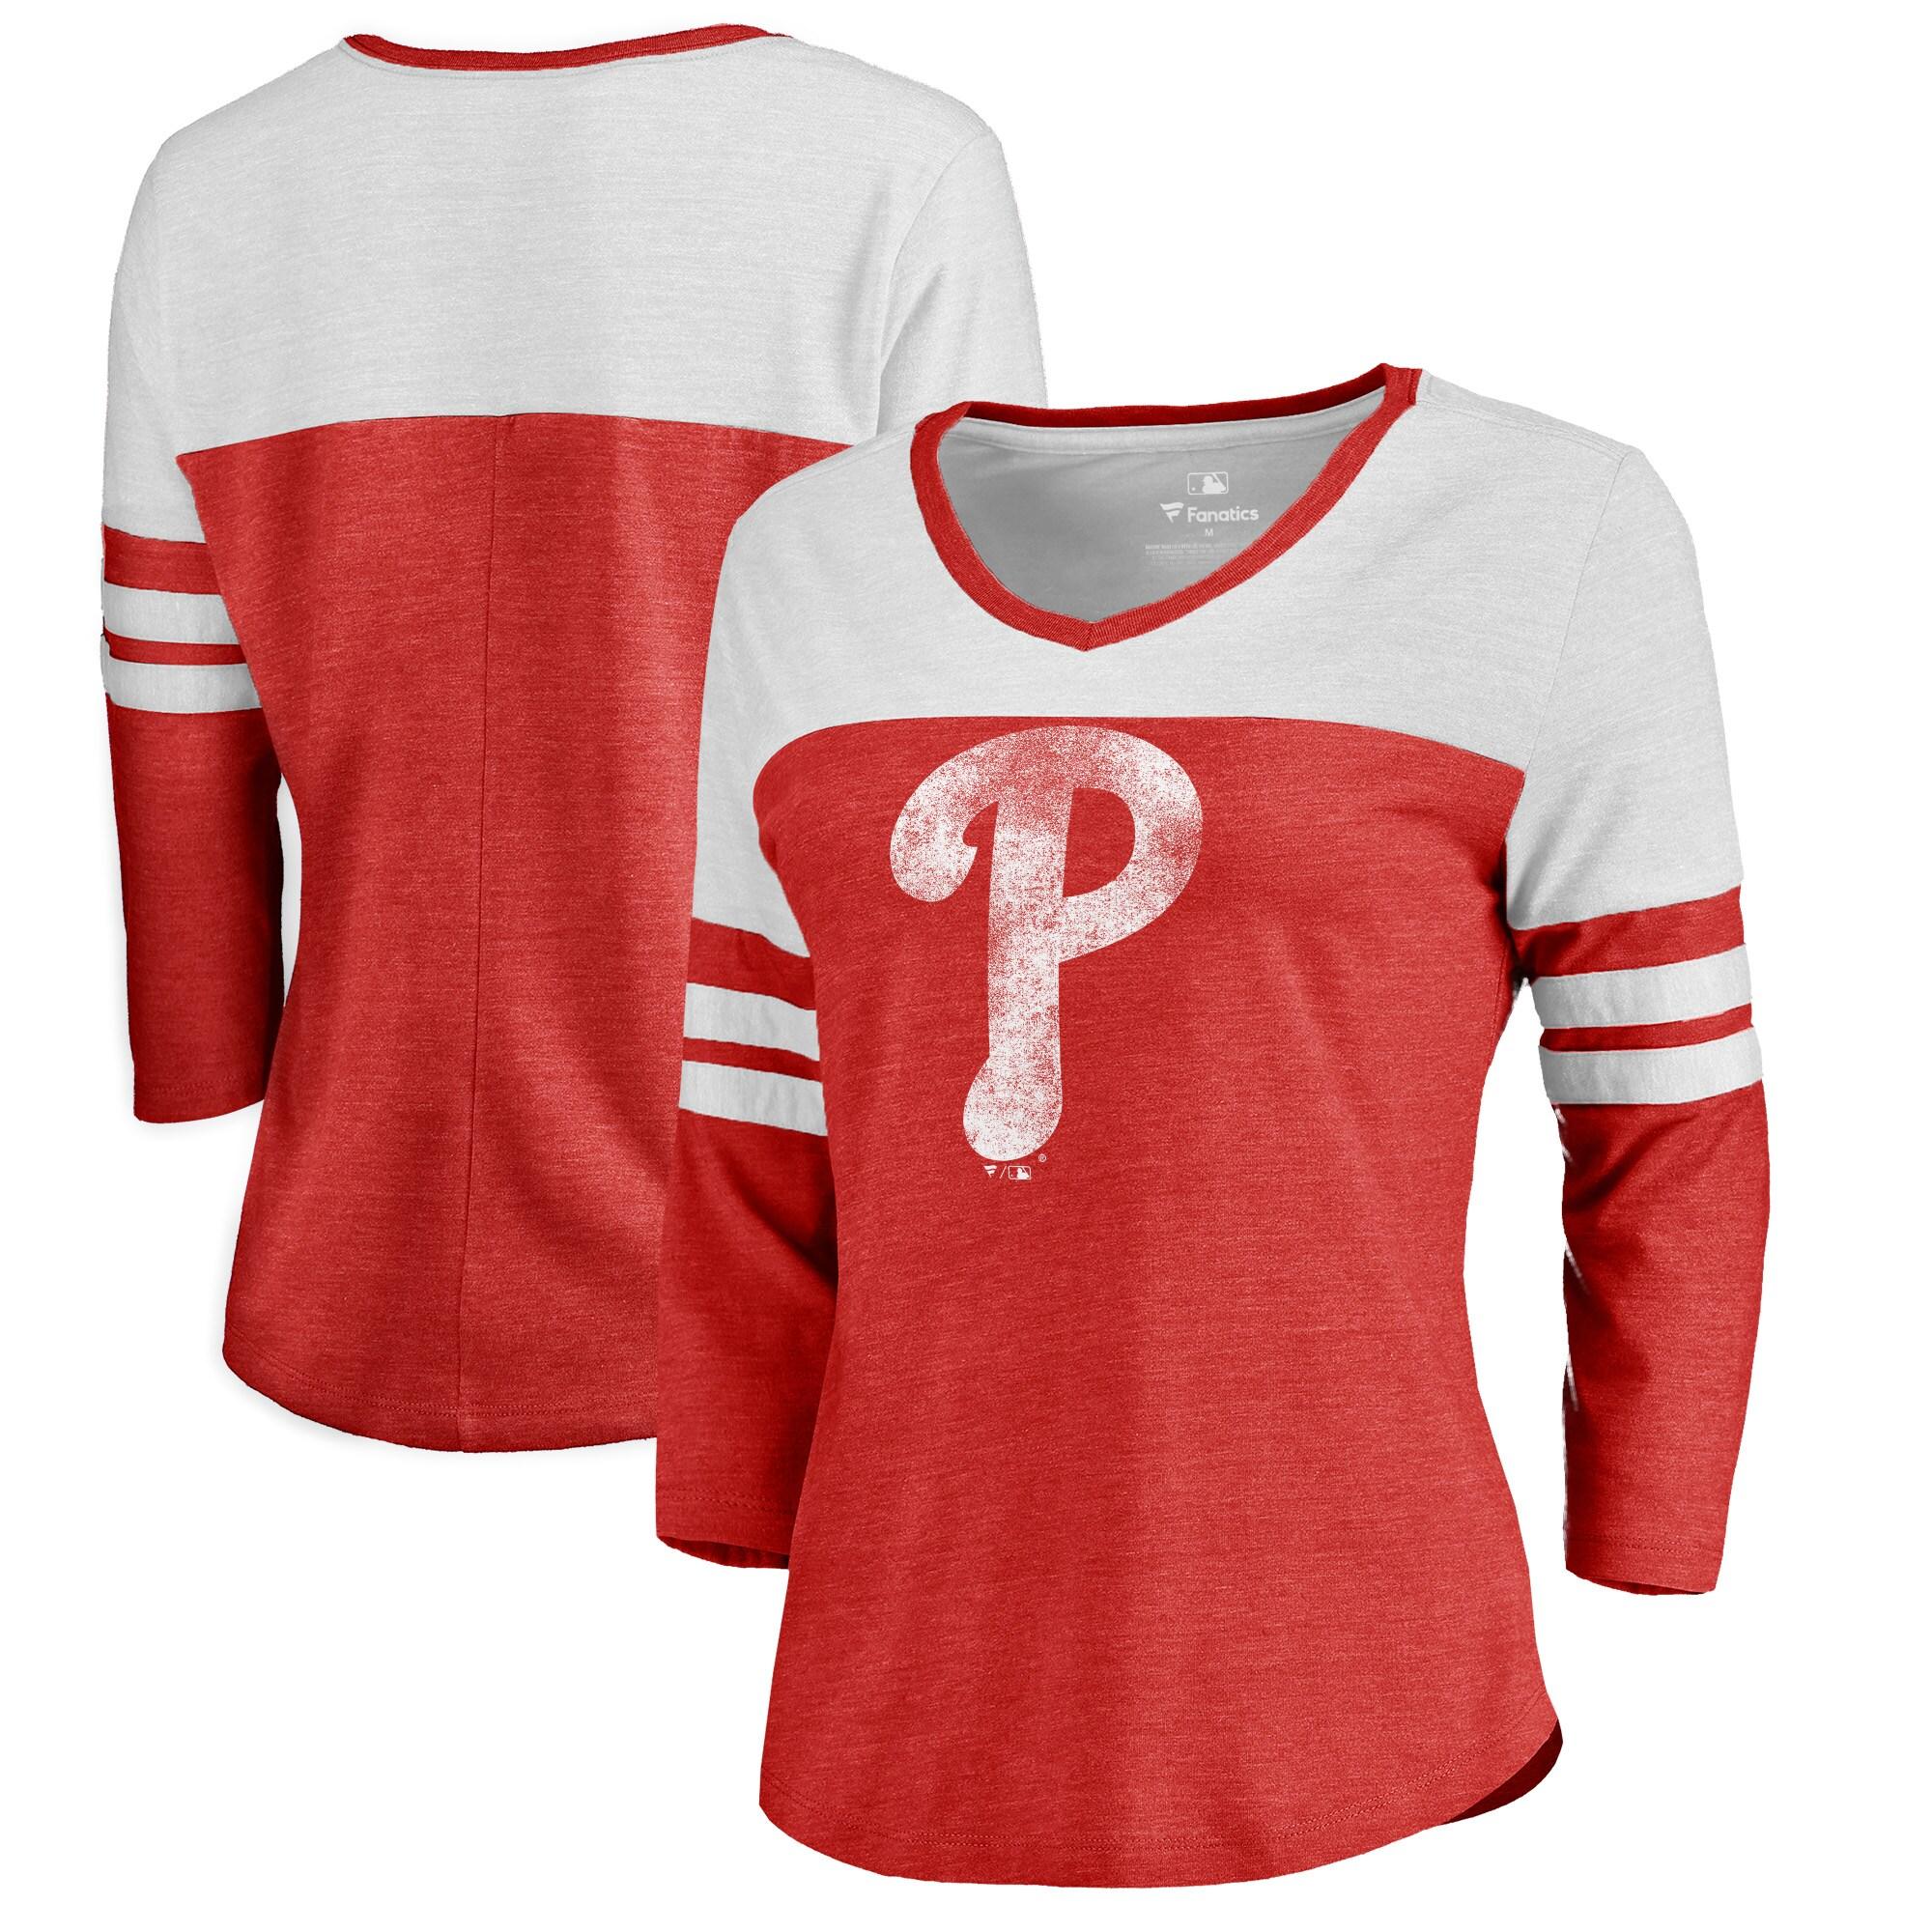 Philadelphia Phillies Fanatics Branded Women's Distressed Team Logo 3/4 Sleeve Tri-Blend T-Shirt - Red/White